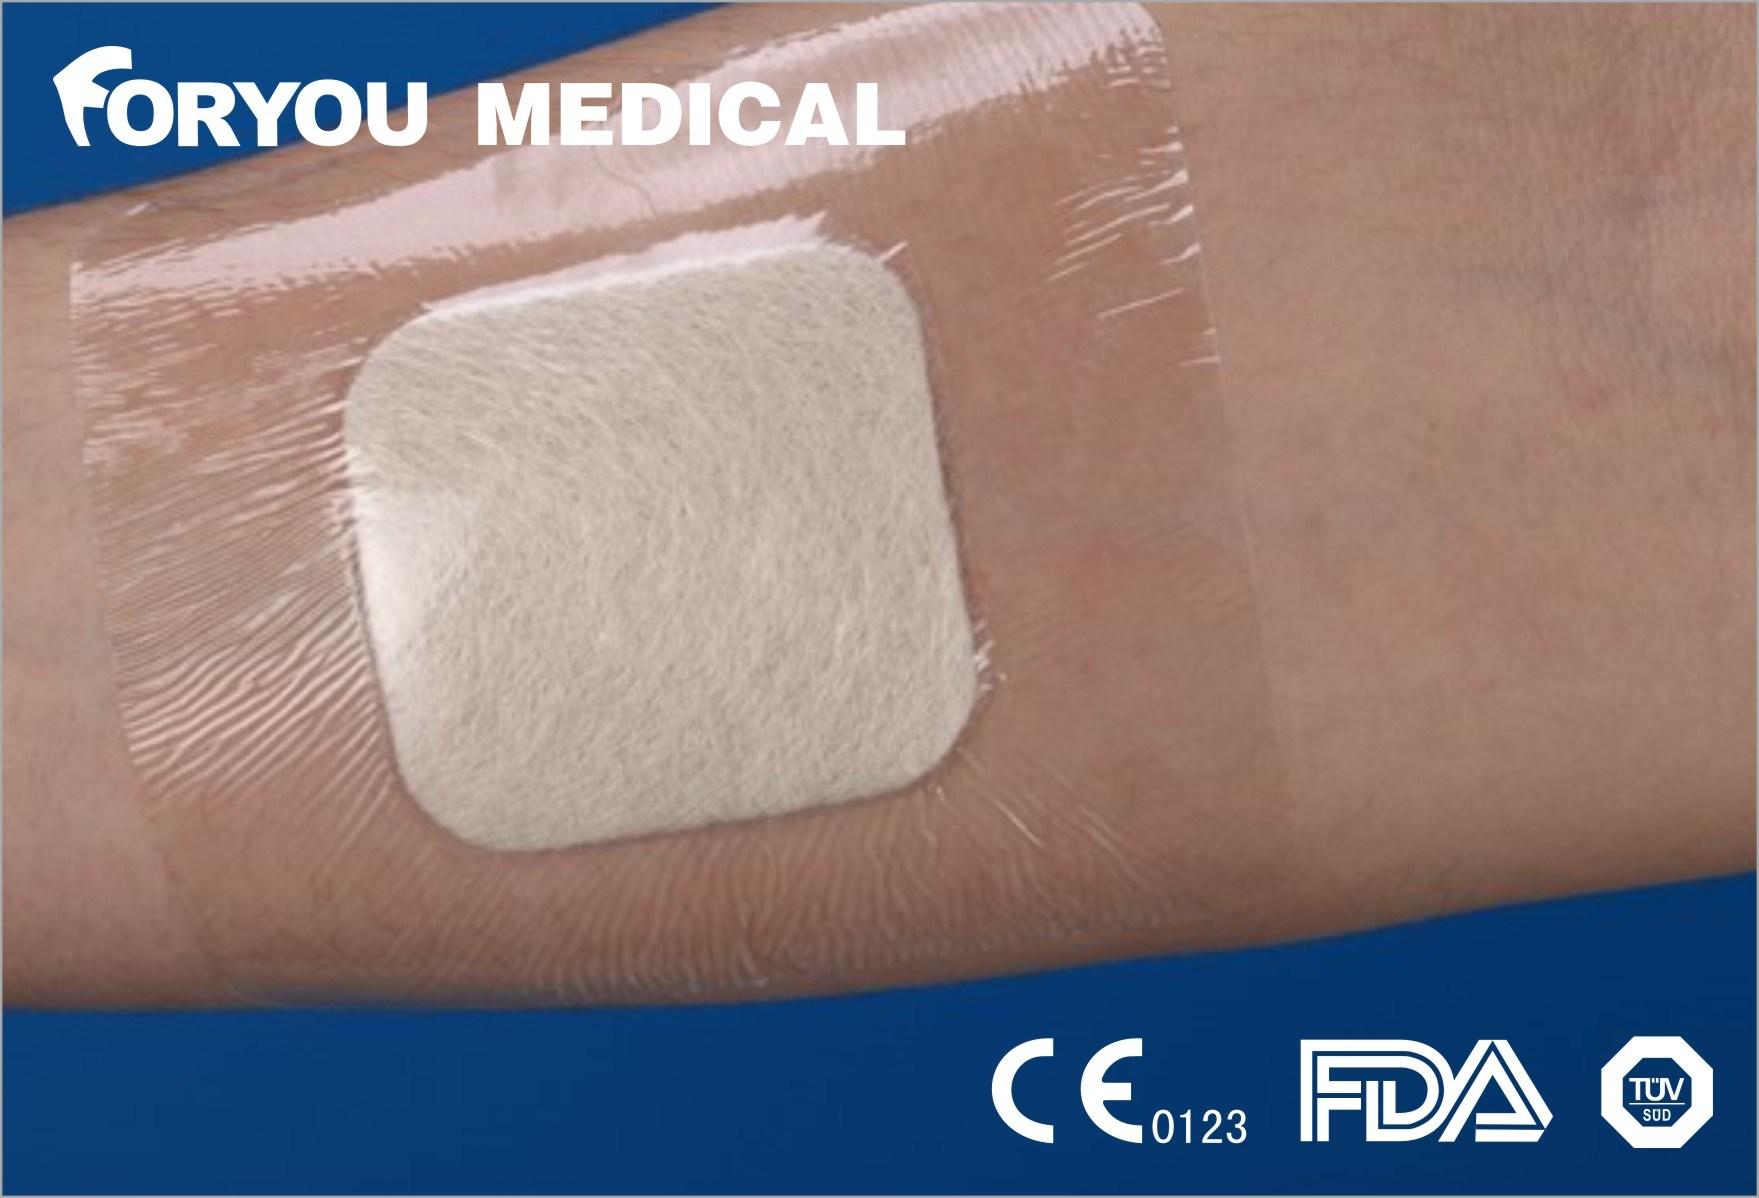 Exuding china adhesive alginate ulcer dressing high exuding wound cover